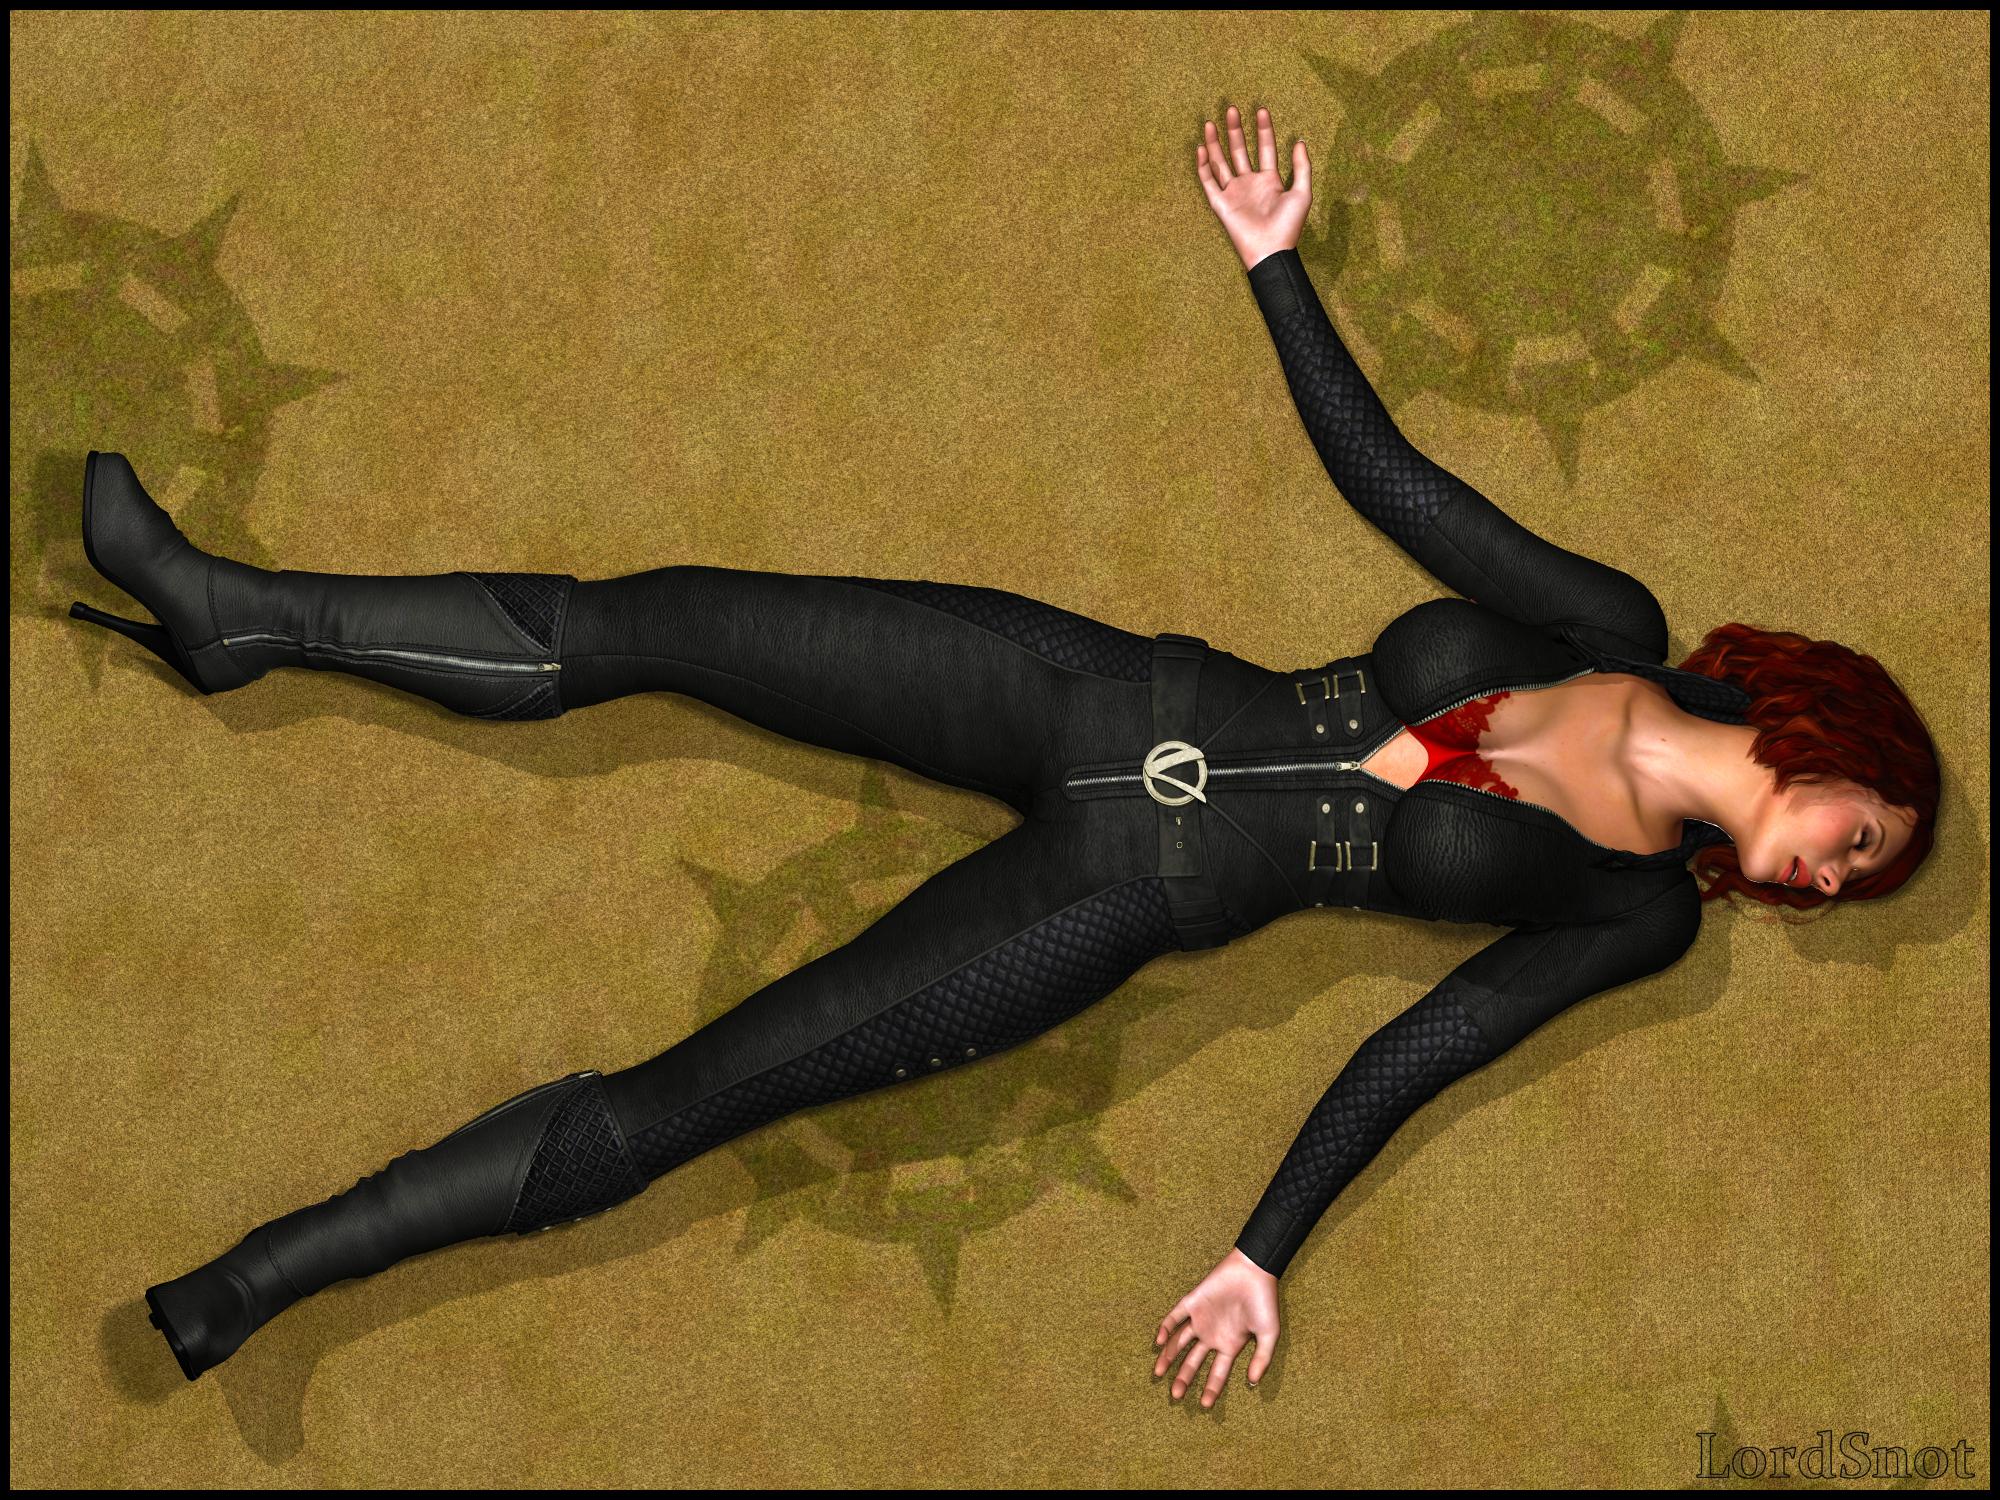 black_widow_unzipped_01_by_lordsnot-d9iei85.png